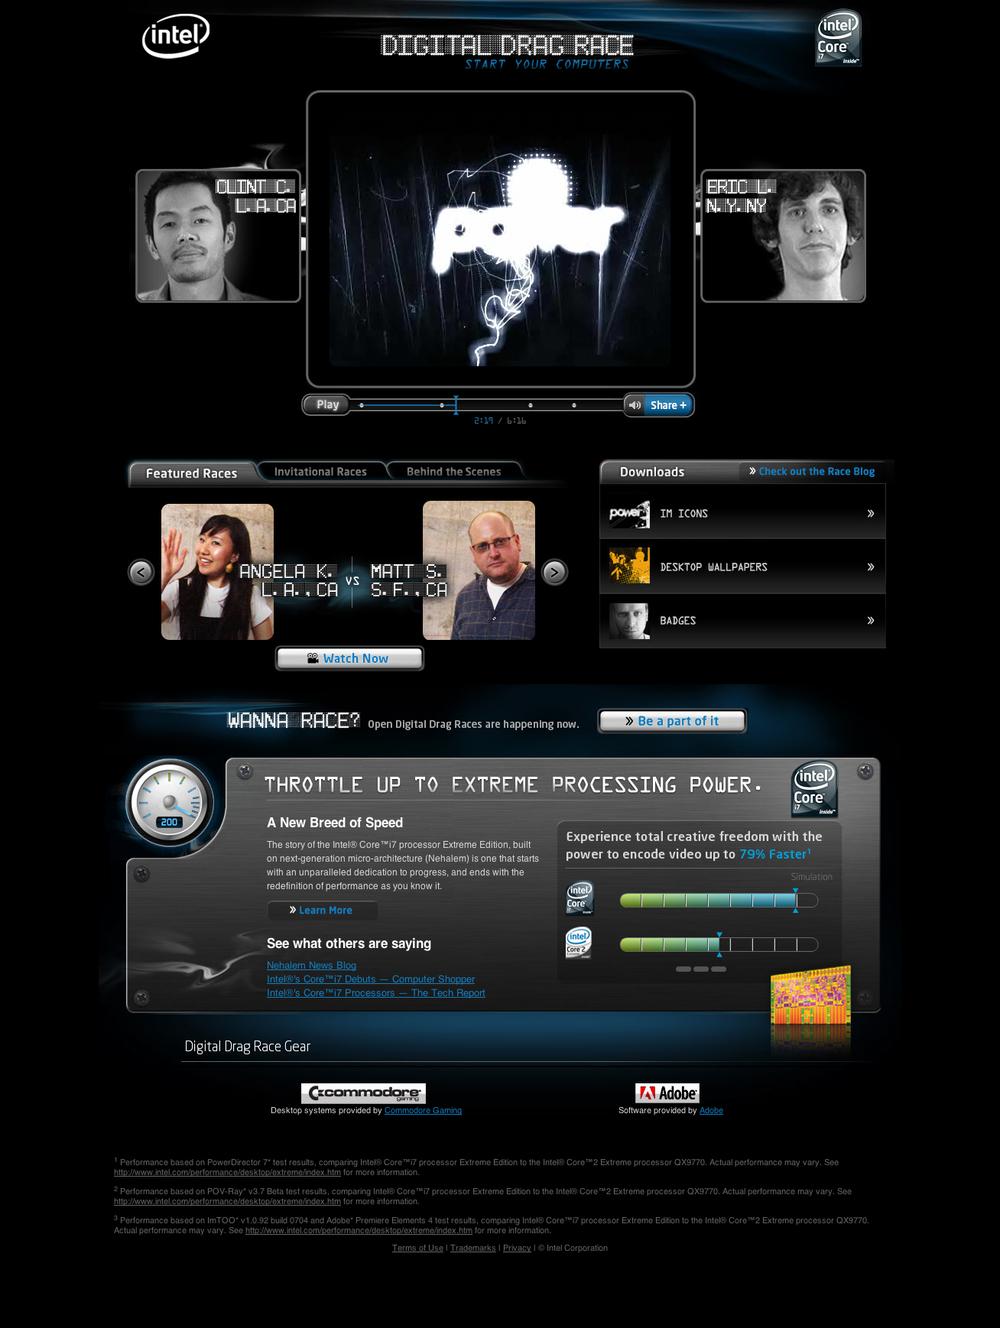 Intel's Digital Drag Race